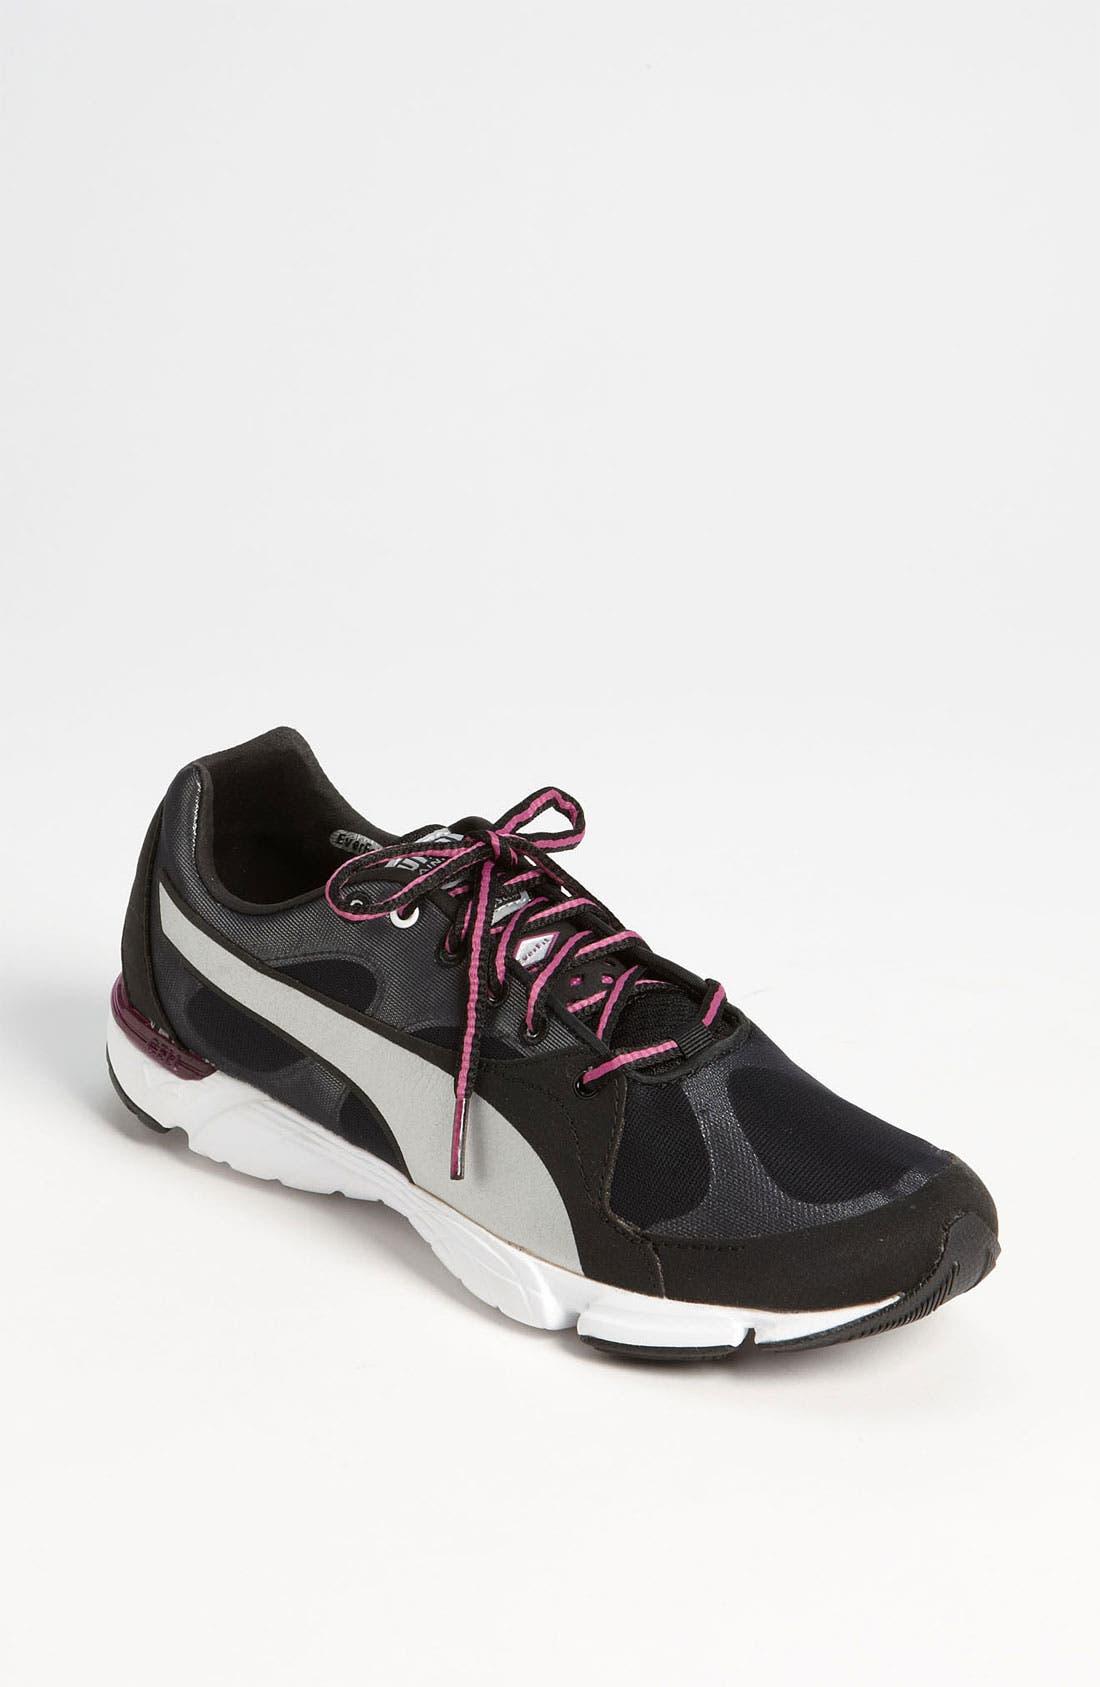 Alternate Image 1 Selected - PUMA 'Formlite XT' Sneaker (Women)